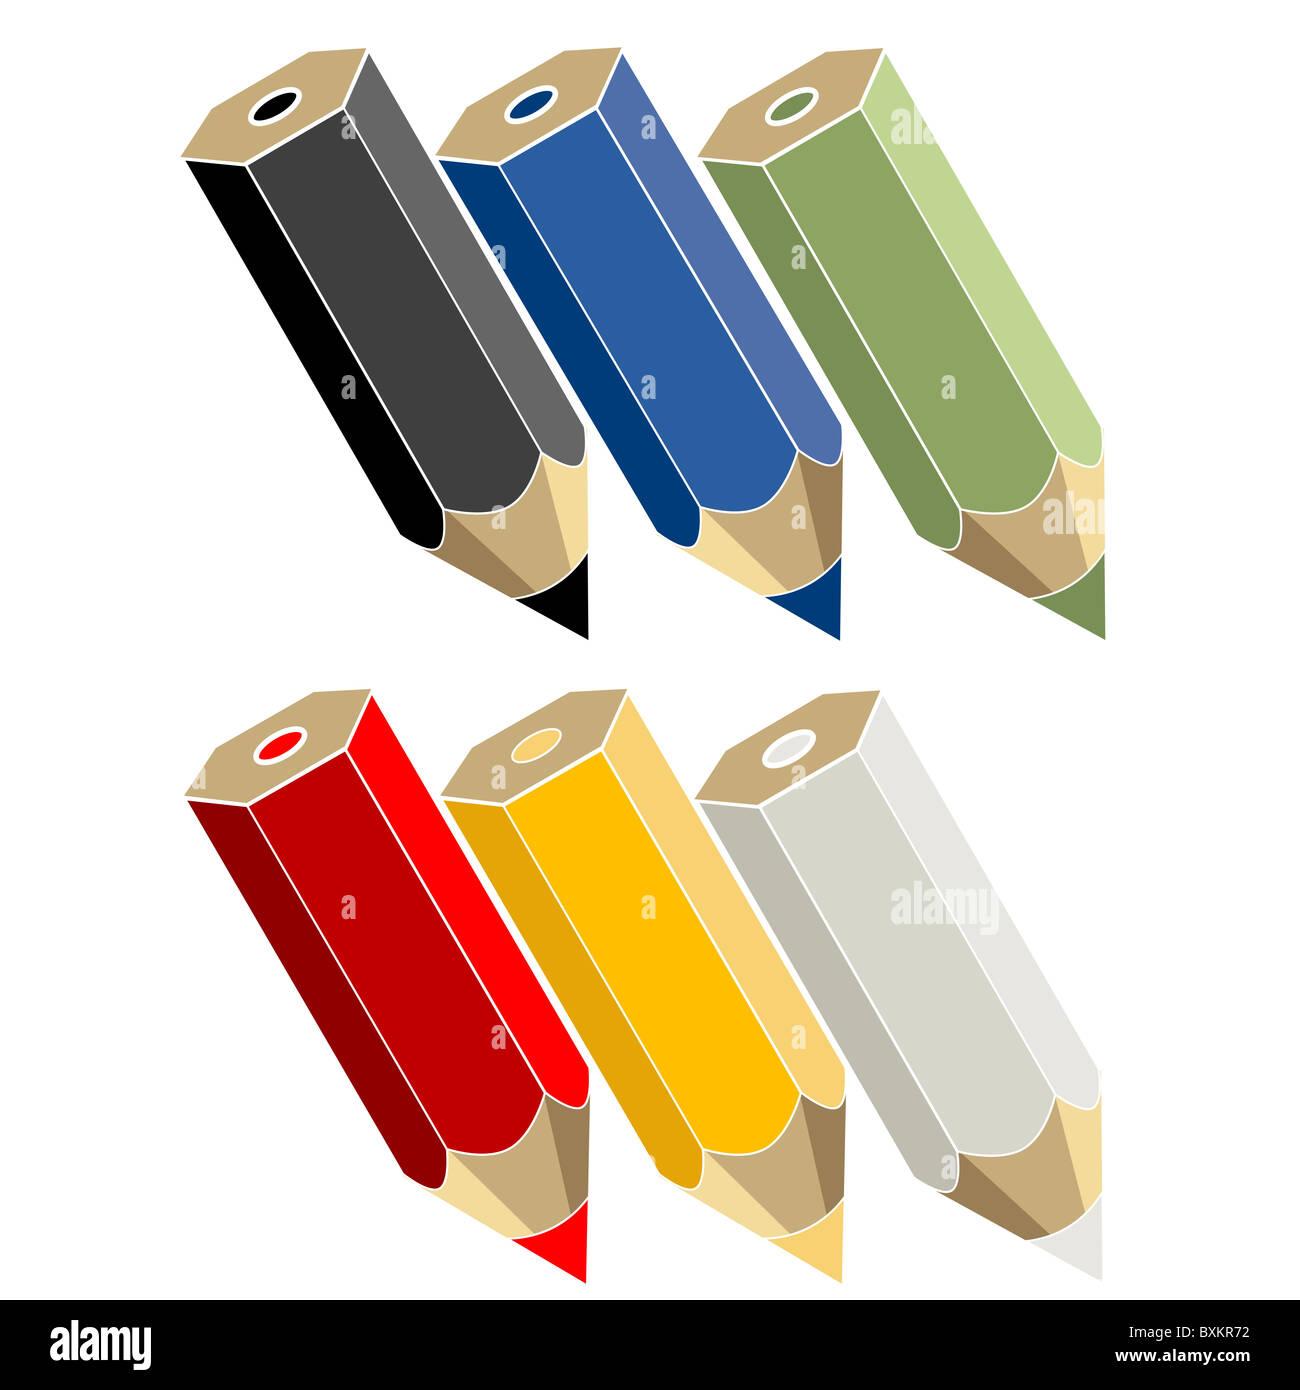 crayons - Stock Image